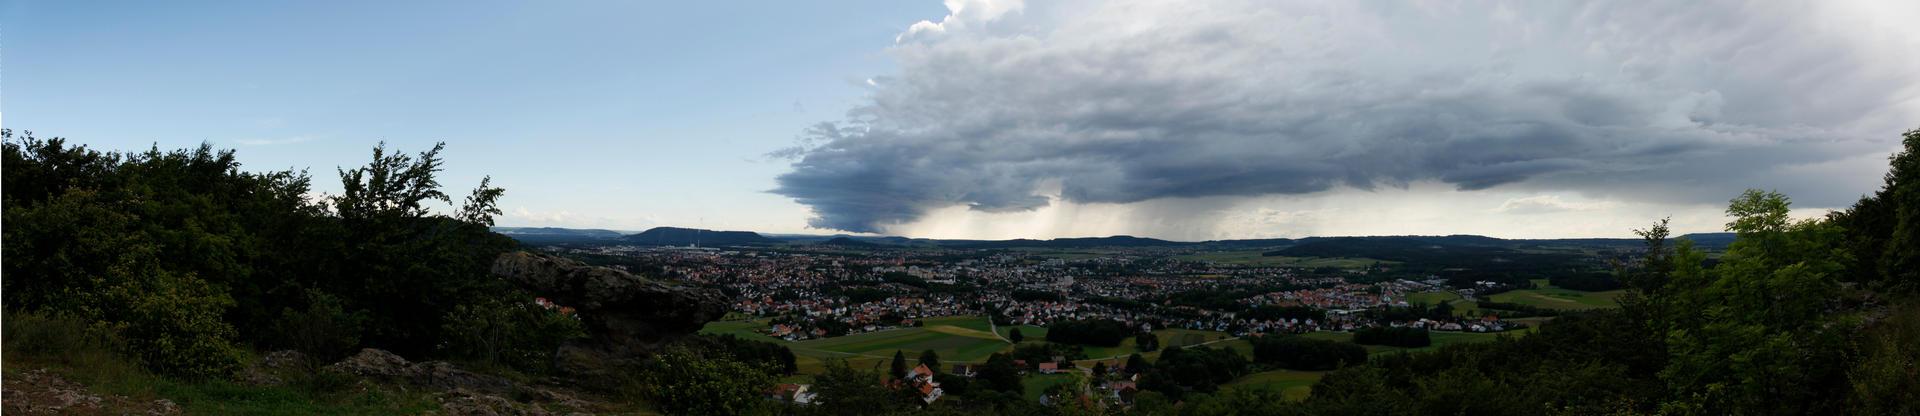 Bad weather at Neumarkt Opf by Bastlwastl84